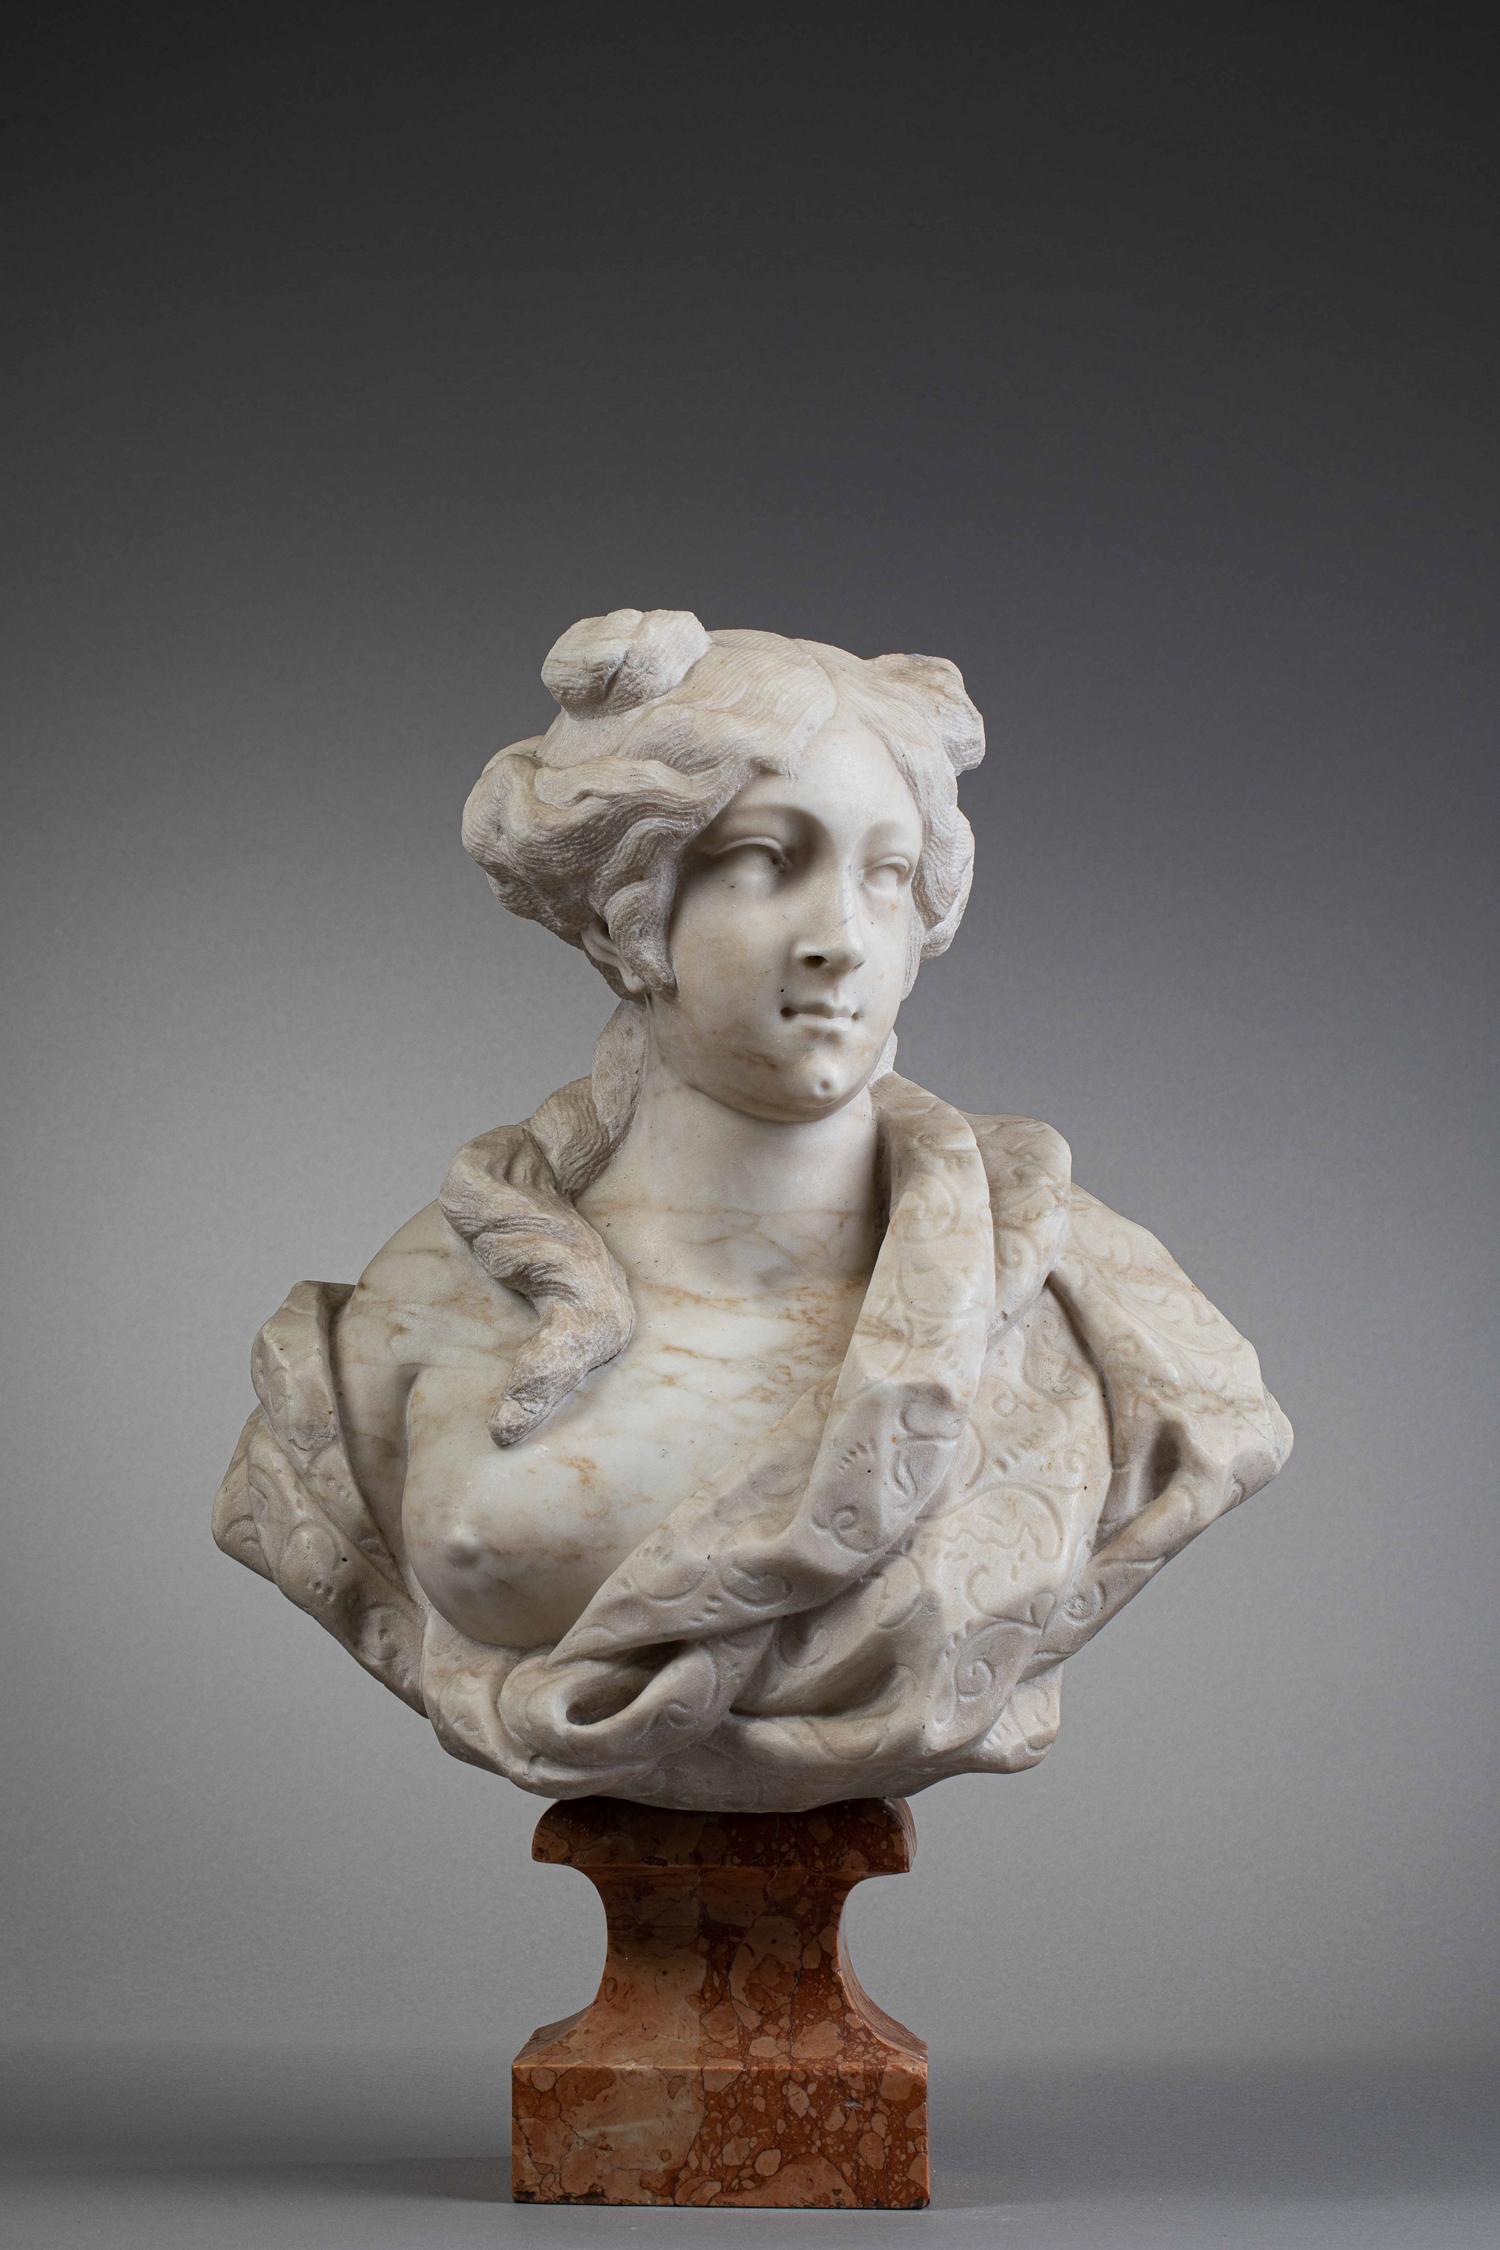 GIOVANNI BONAZZA (Venice, 1654 - Padova, 1736) - BUST OF WOMAN